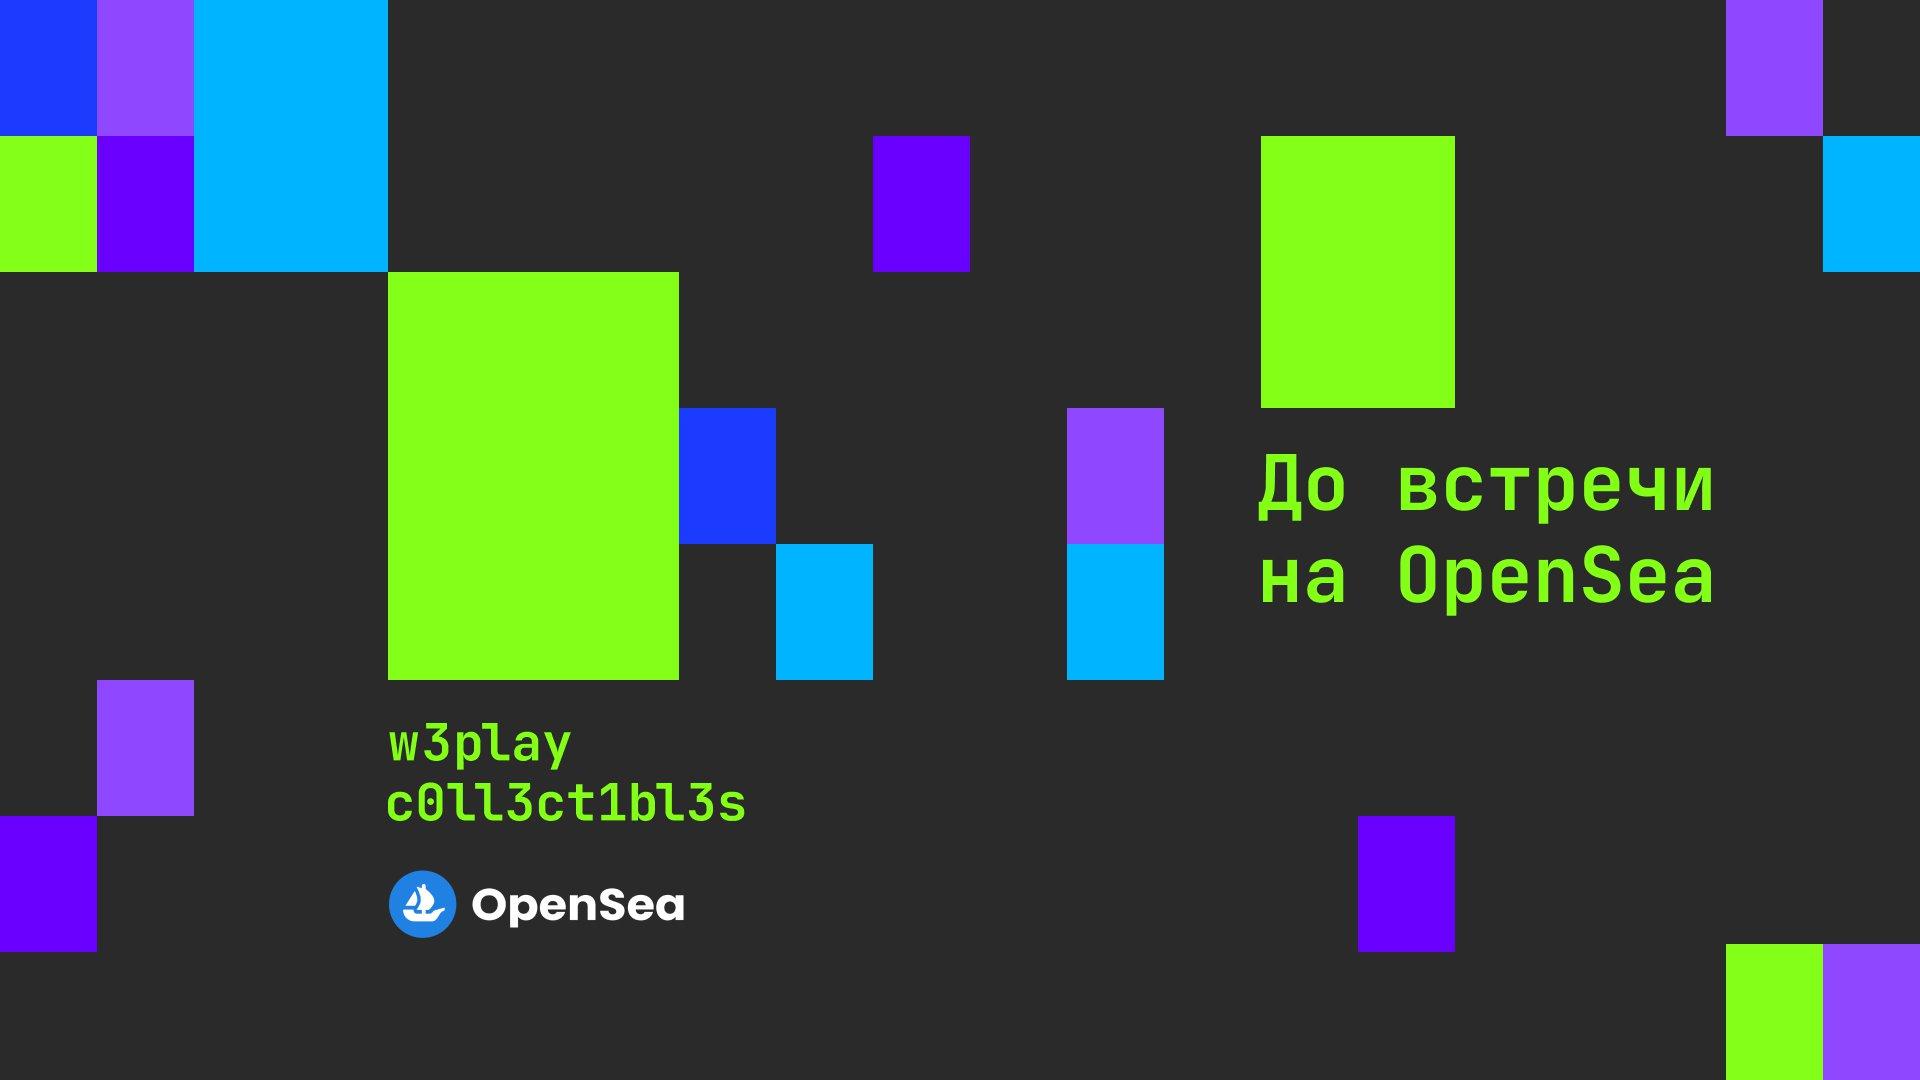 WePlay Collectibles: увидимся на OpenSea. Изображение: WePlay Holding